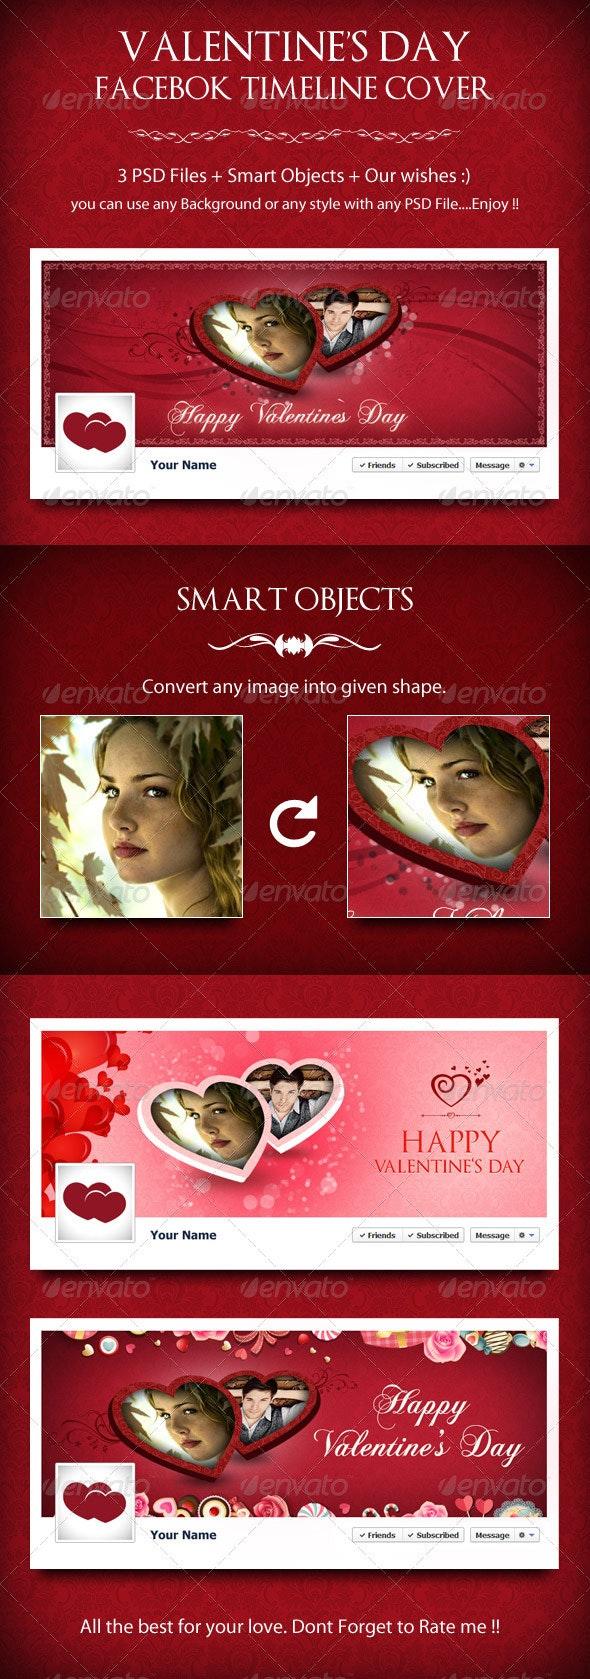 Valentine's Day Timeline Cover - Facebook Timeline Covers Social Media